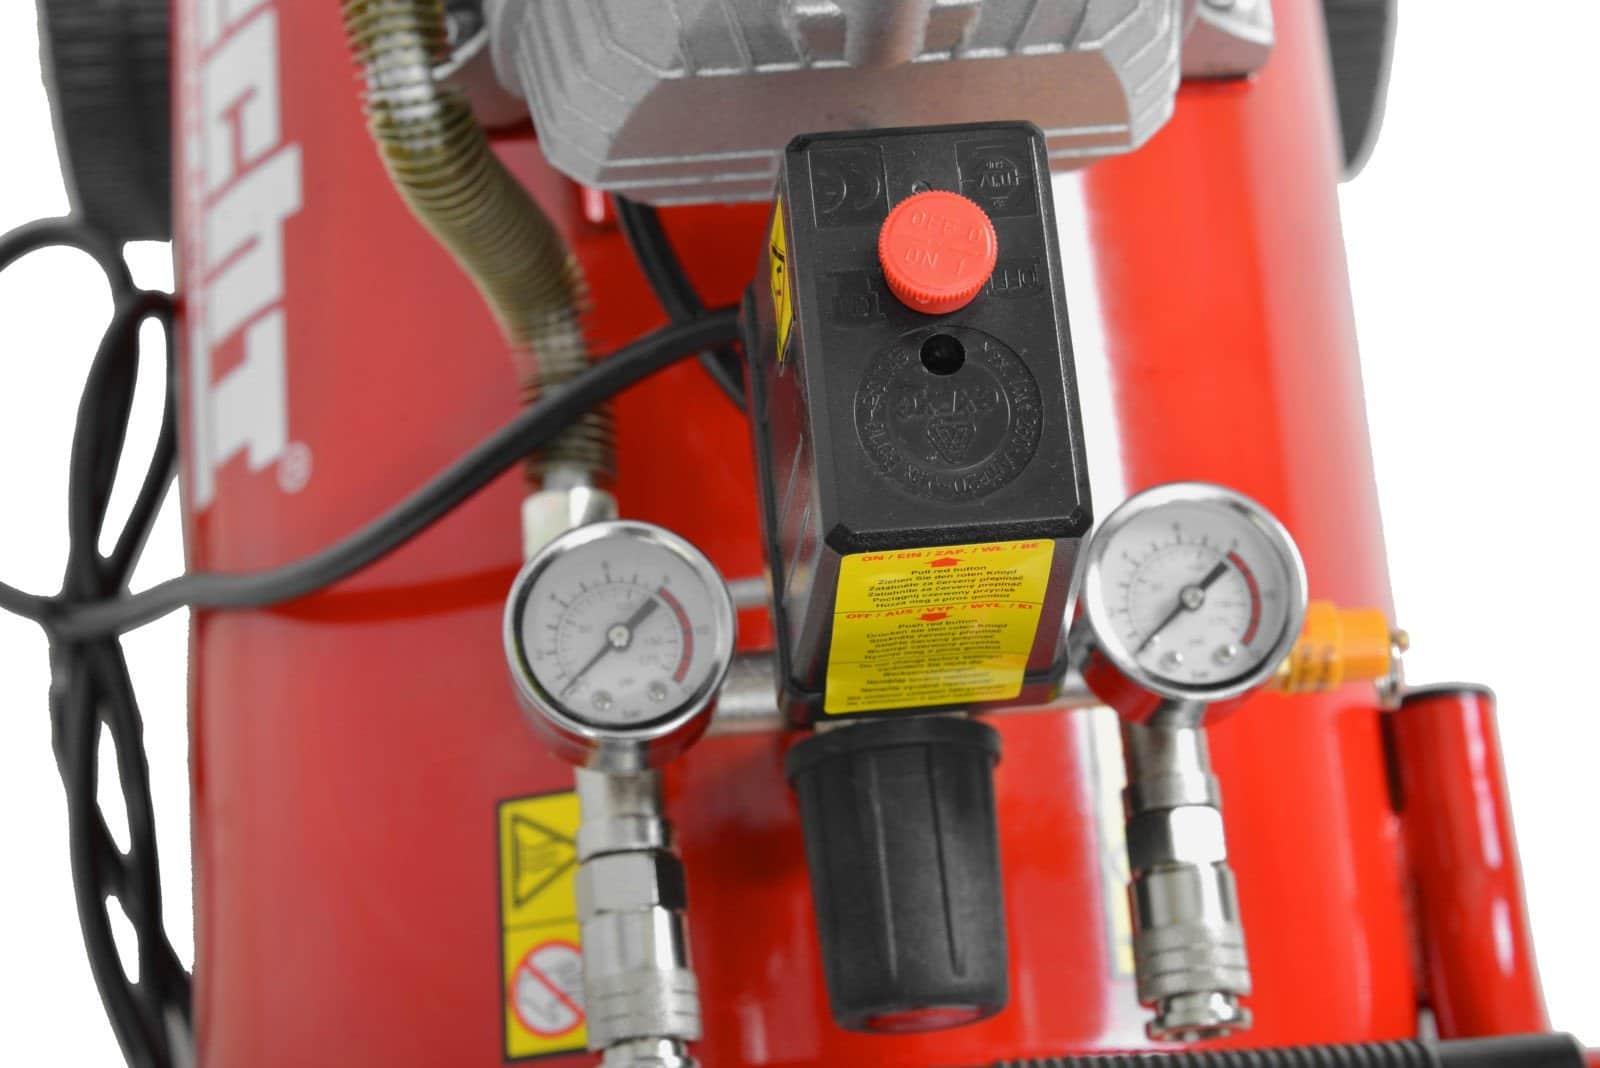 Compressor de ar comprimido HCT AR2353